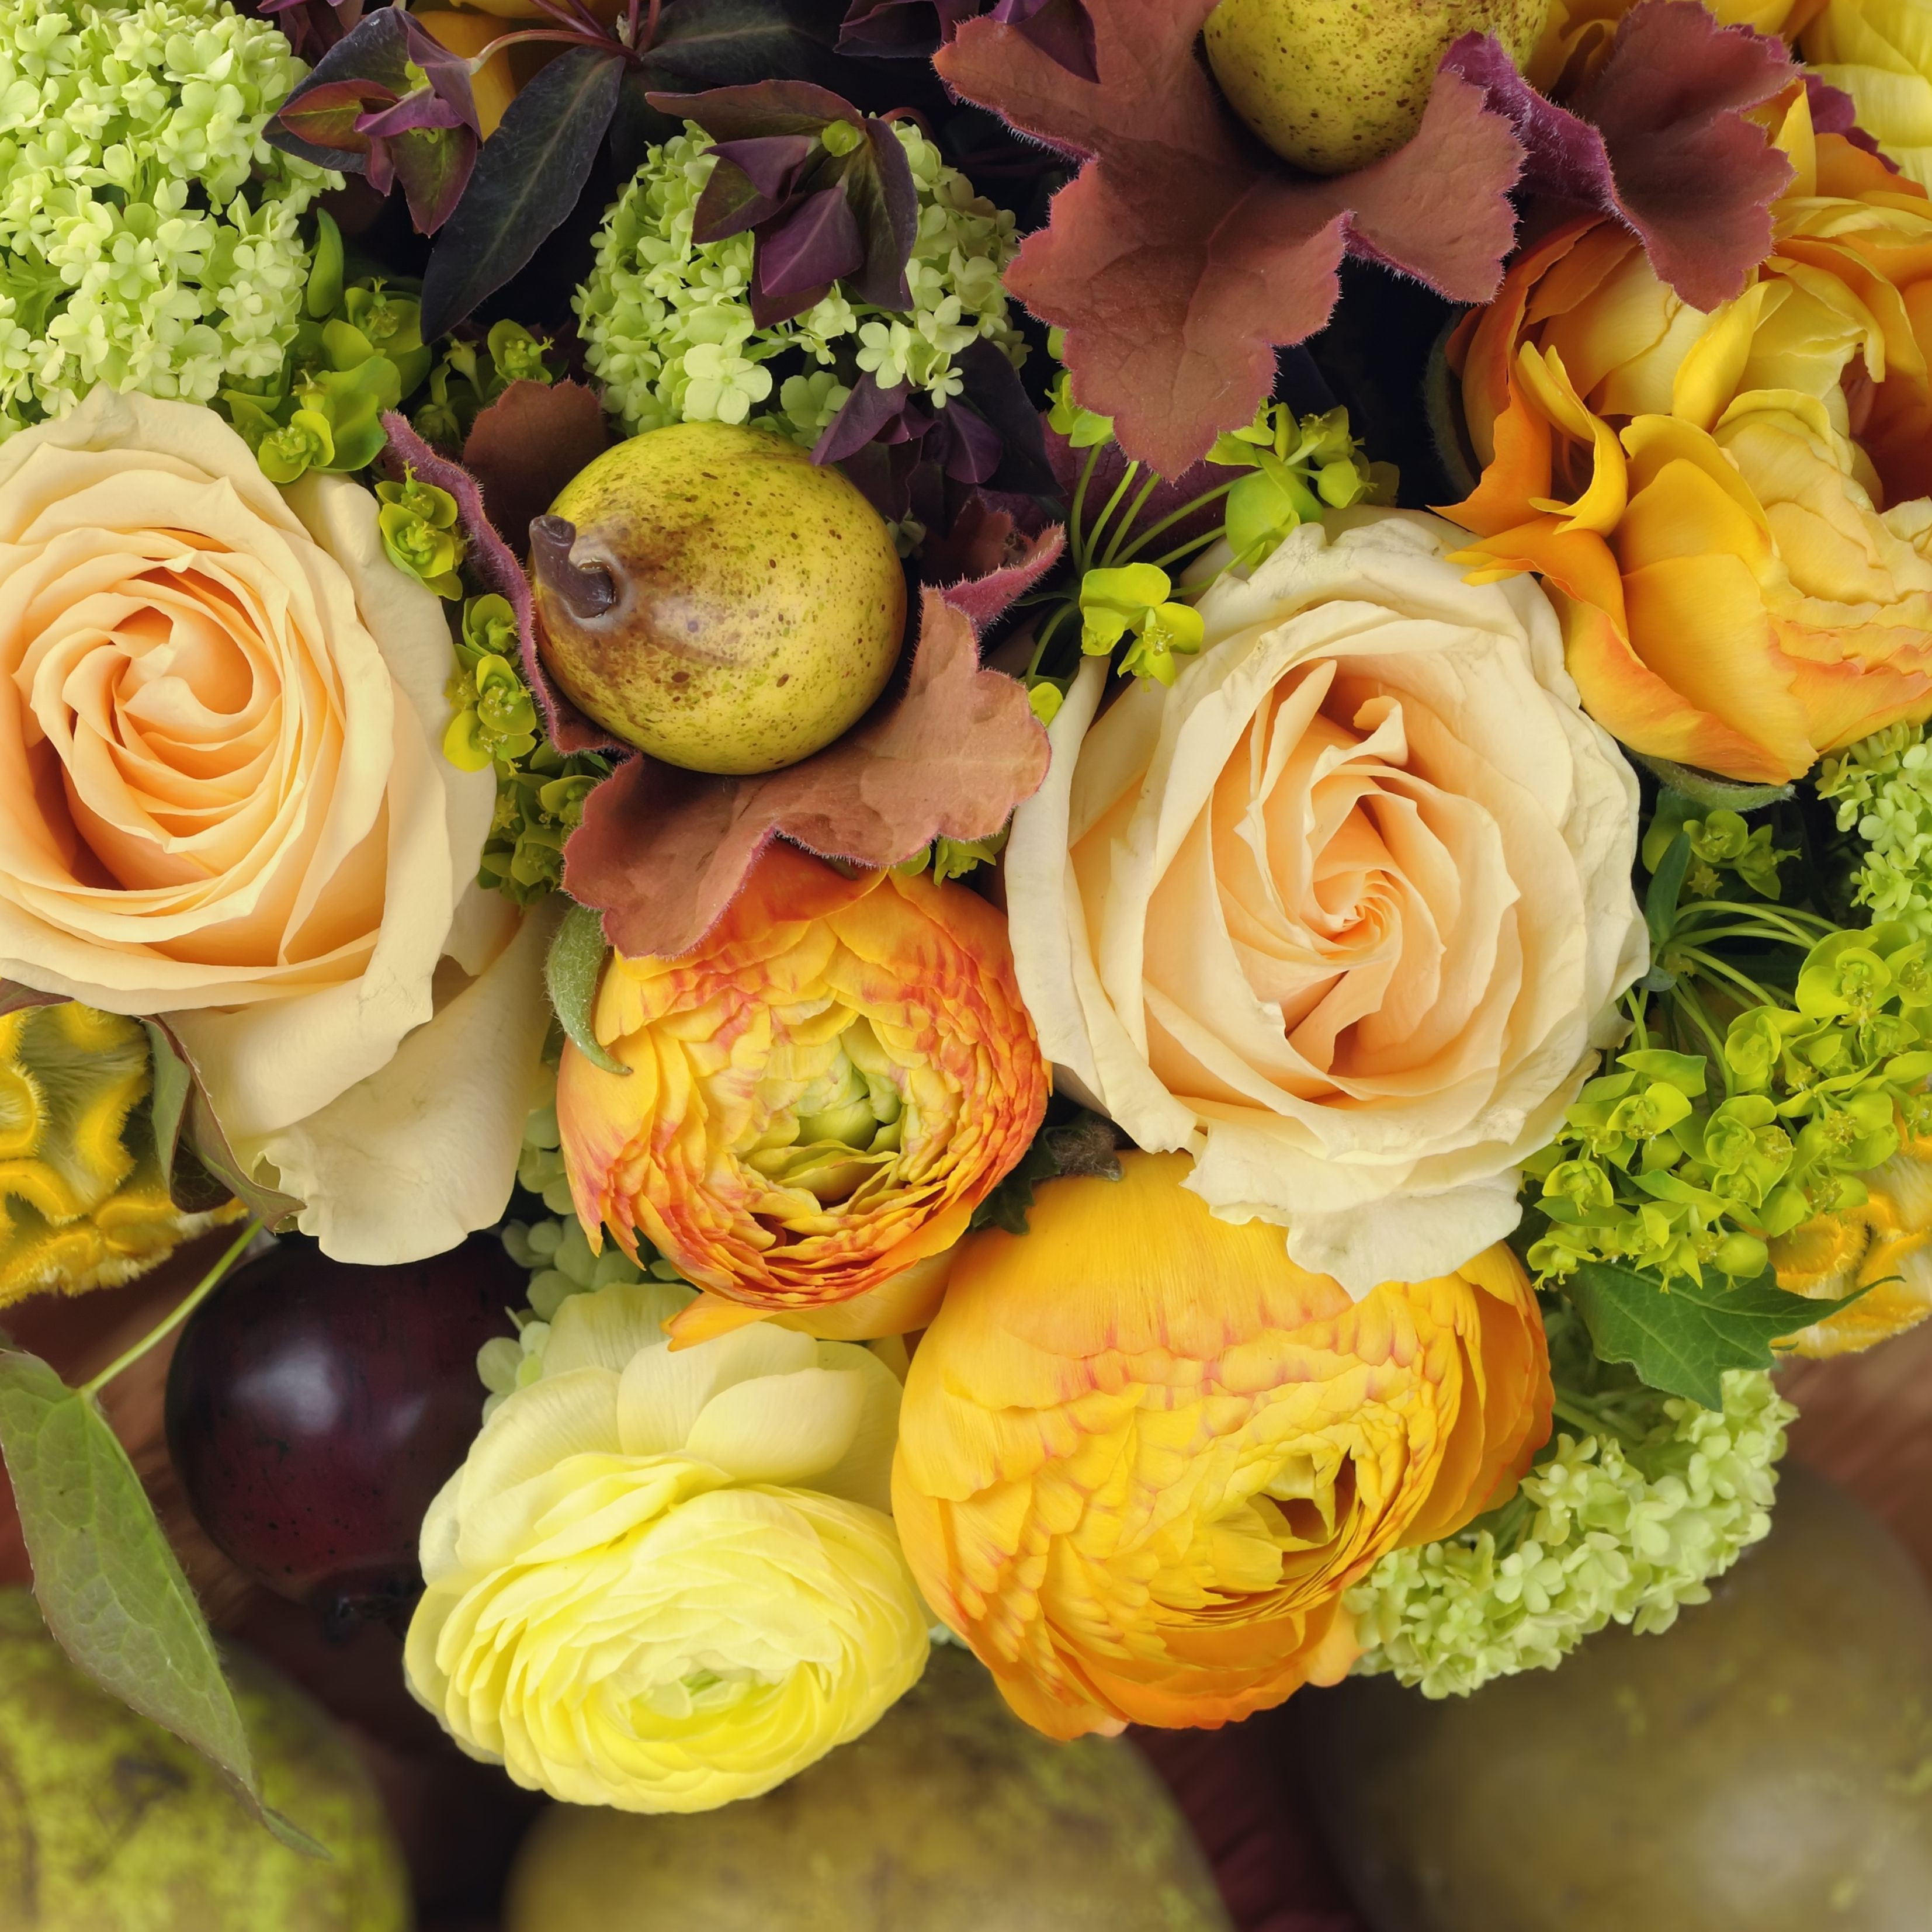 15 Recommended Flower Arrangements with Fruit In Vase 2021 free download flower arrangements with fruit in vase of fall wedding flower gallery inside fall1 57f5388b3df78c690feffda1